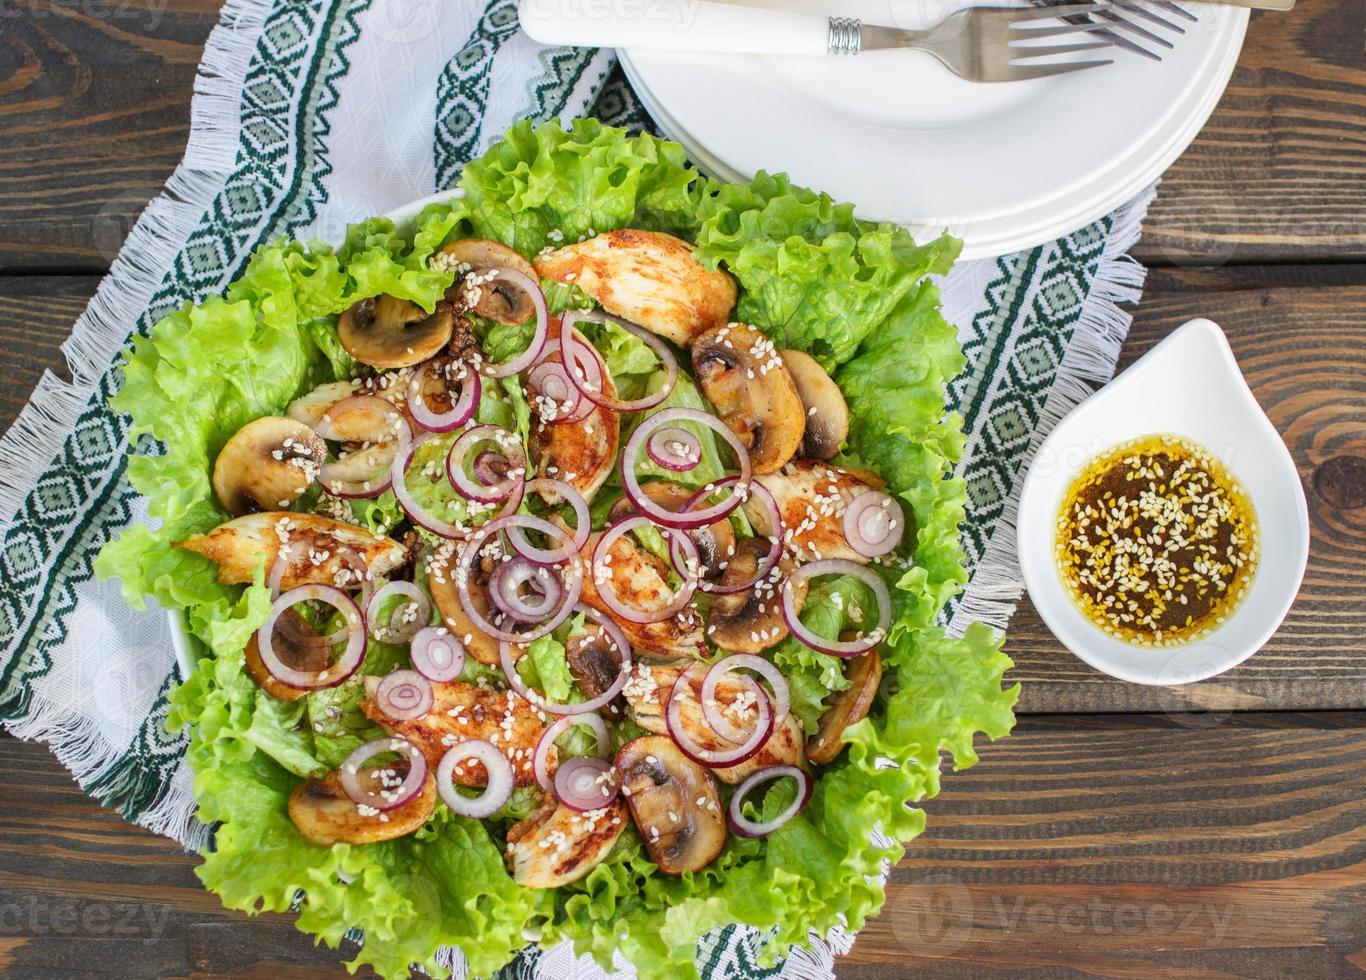 salada de frango com cogumelos, cebola roxa e alface foto